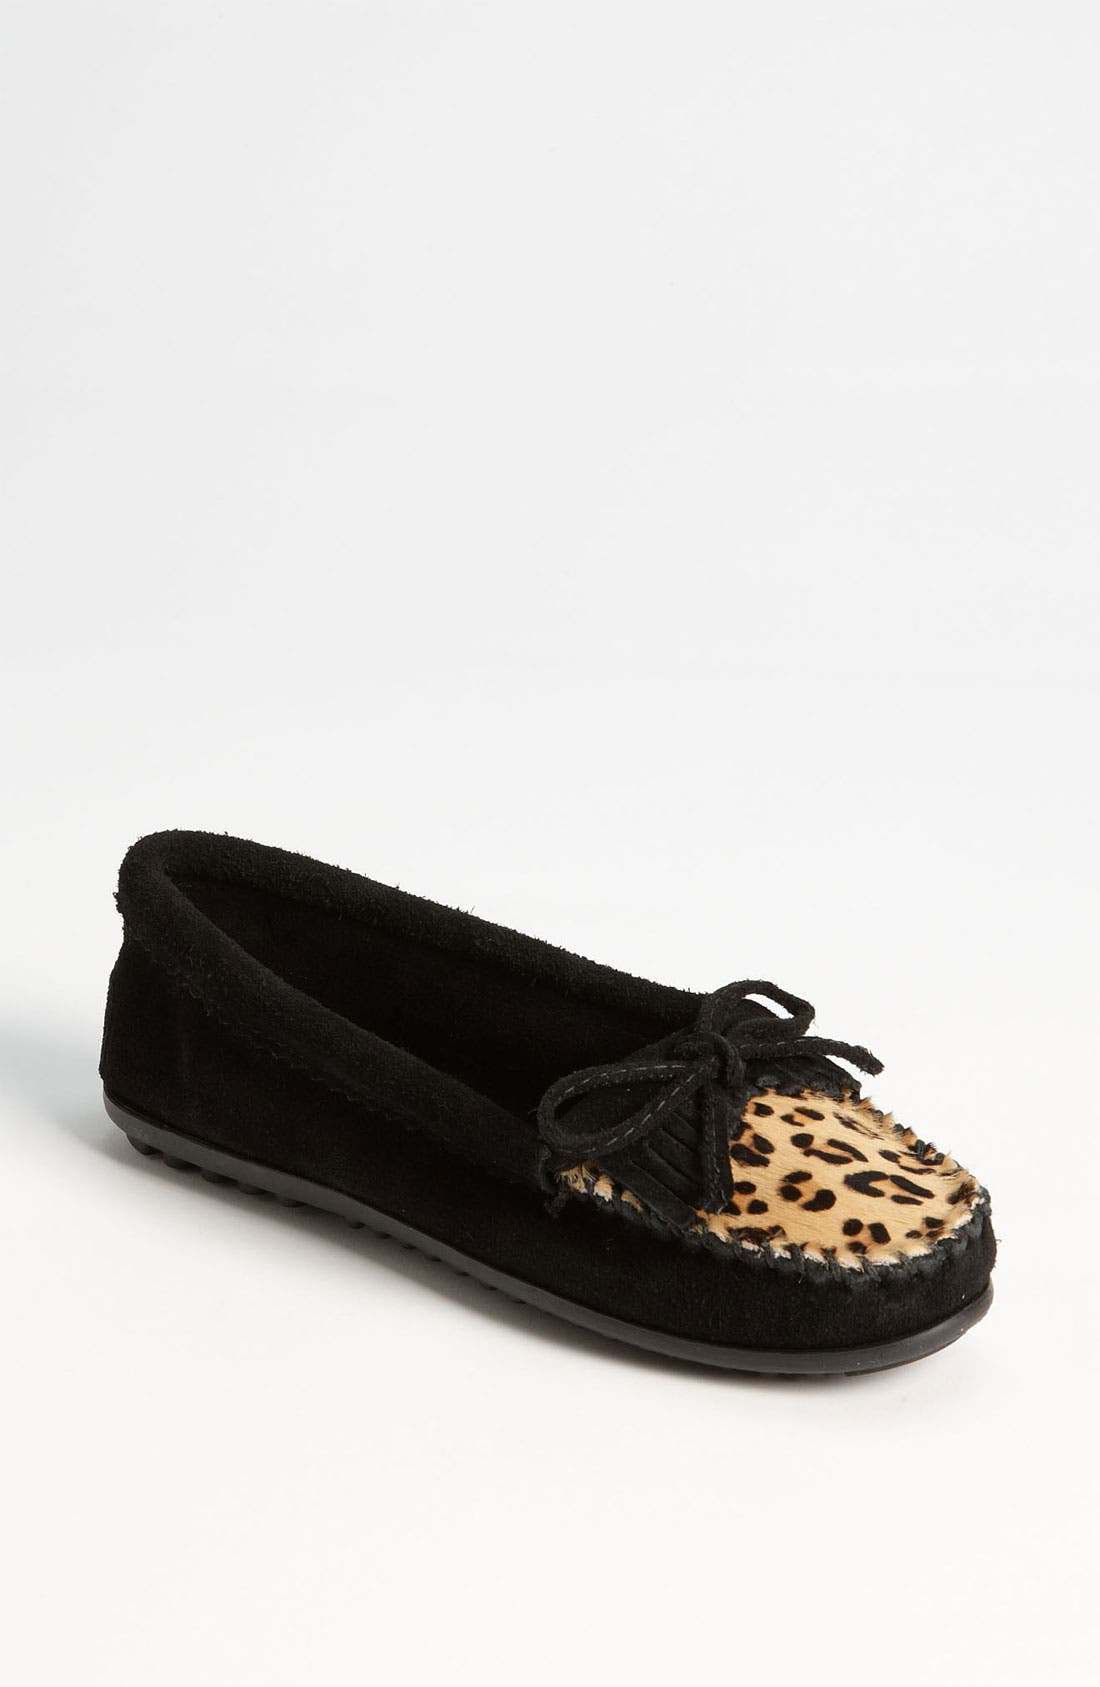 MINNETONKA, 'Leopard Kilty' Moccasin, Main thumbnail 1, color, 001